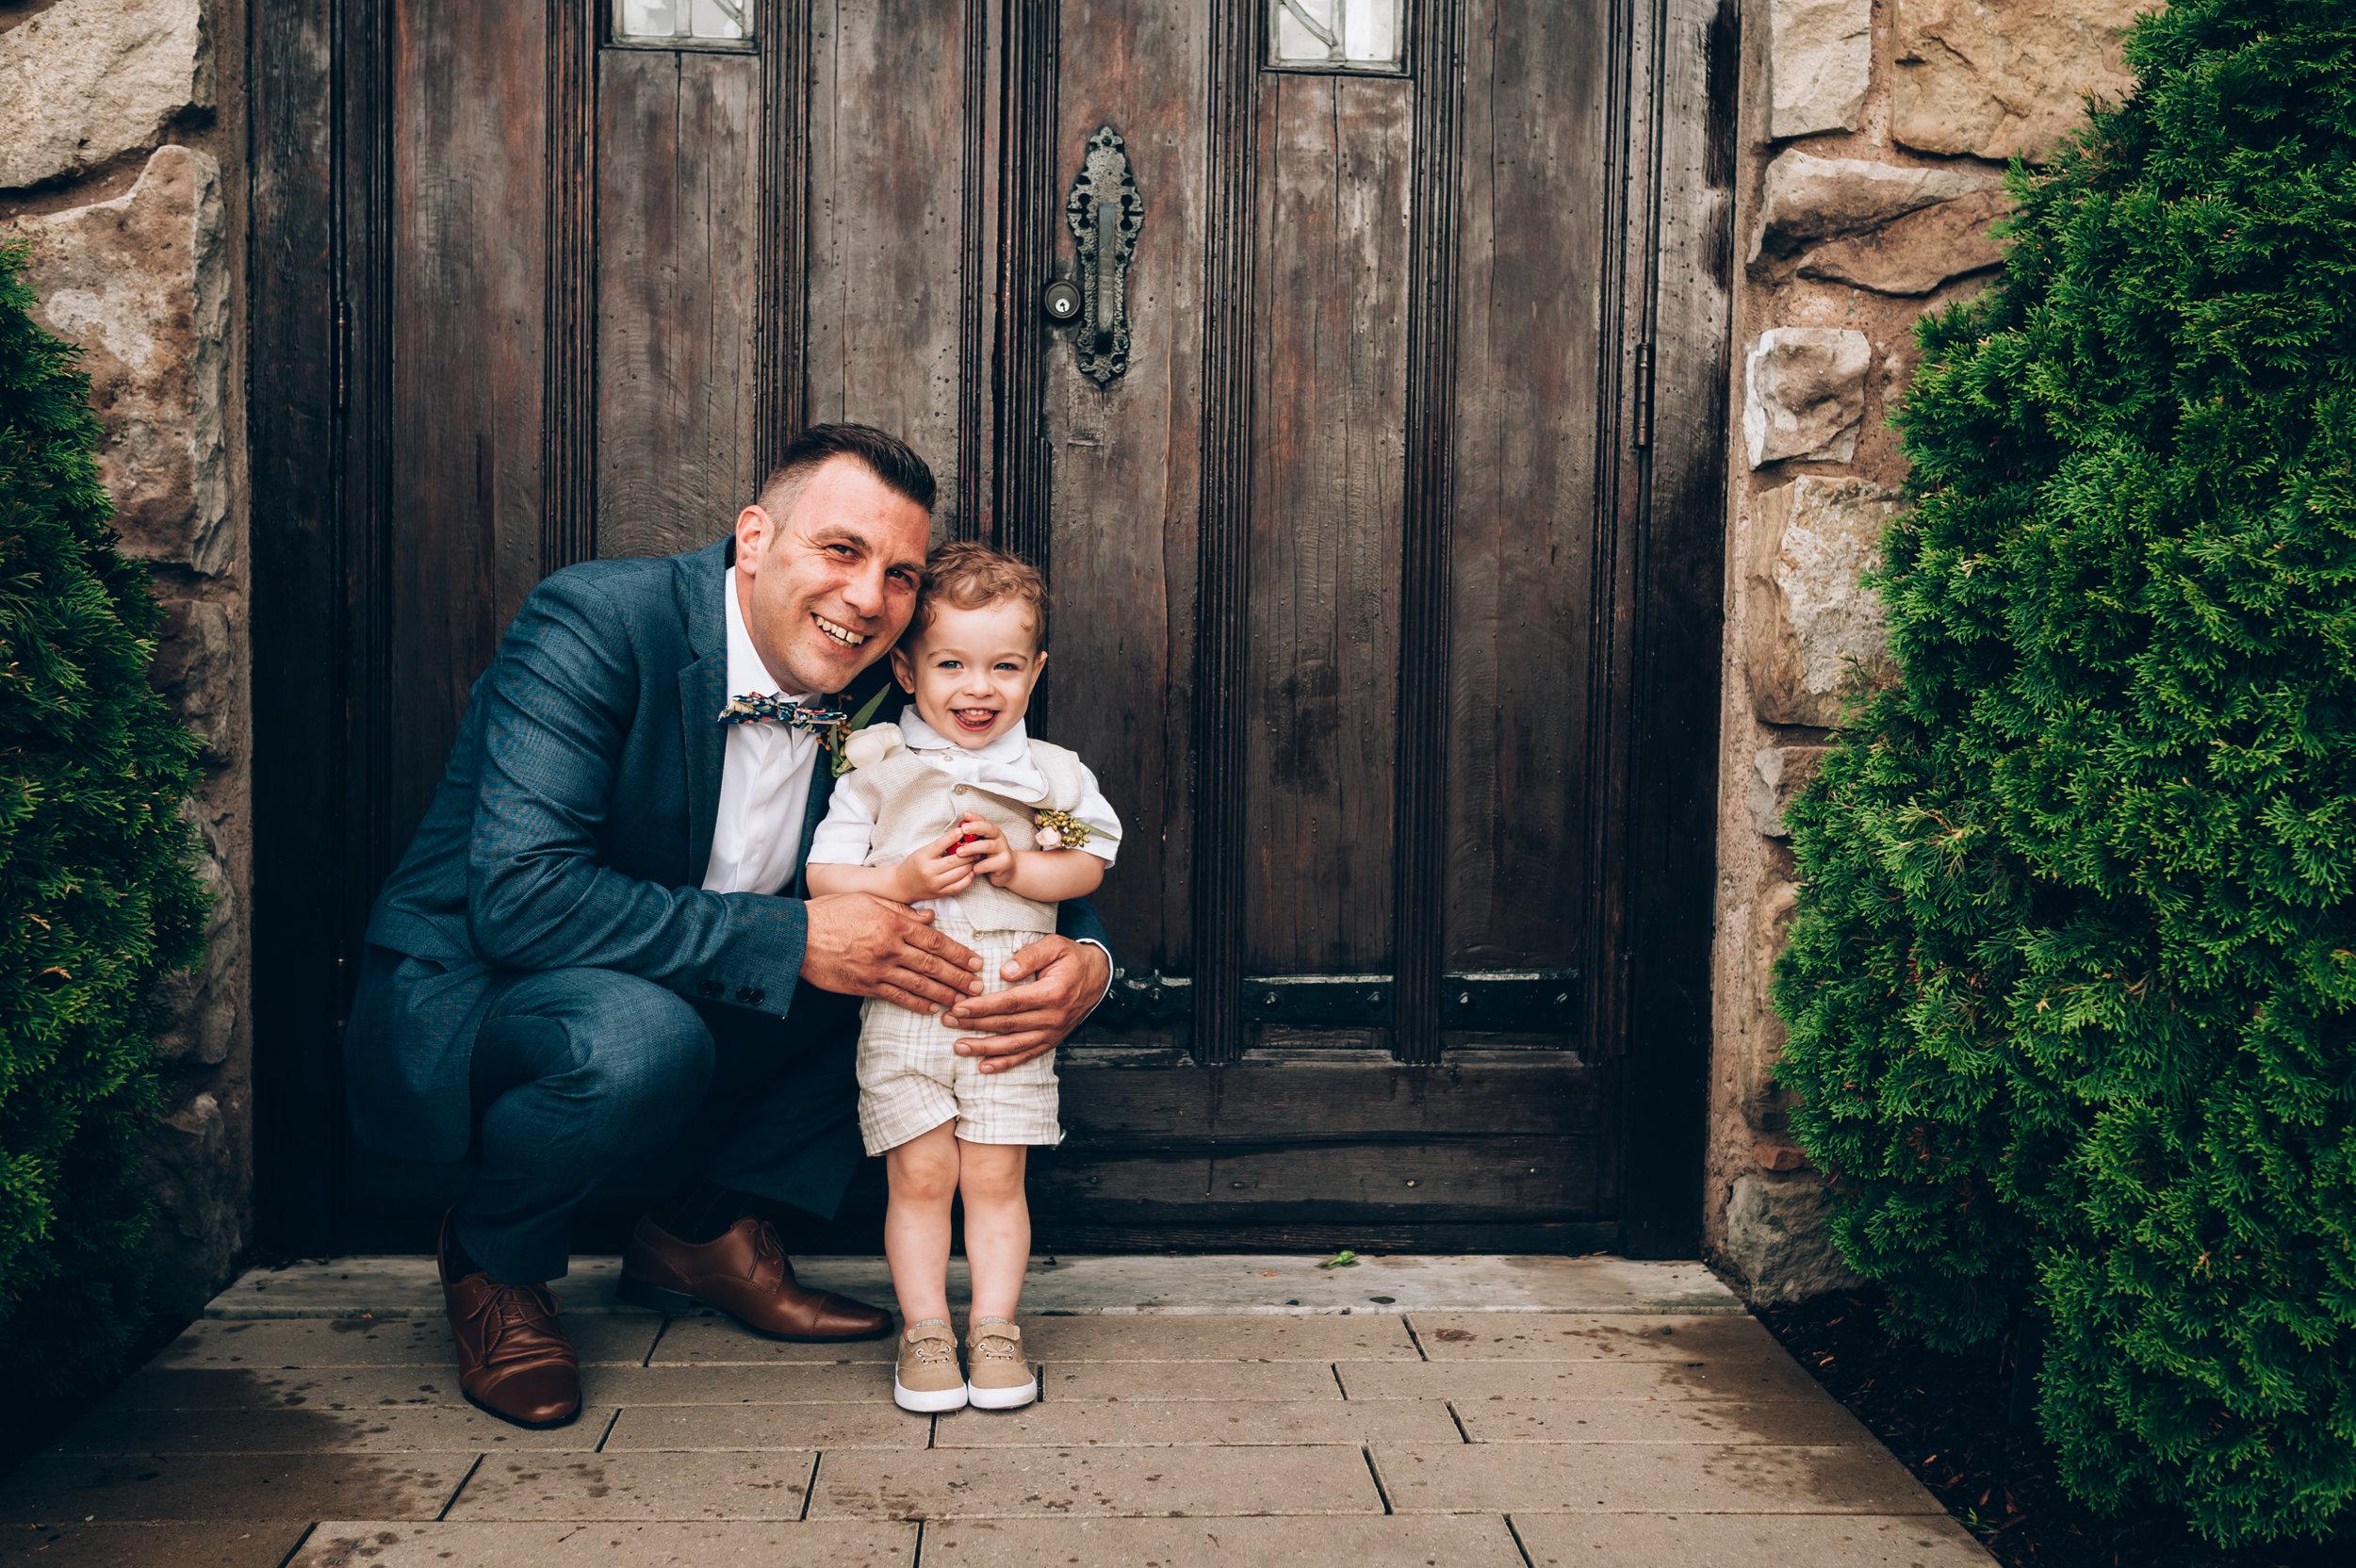 wedding, burlington wedding photographer,love, lifestyle photography,toronto wedding photographer,groom, vineland estetes winery,ring boy